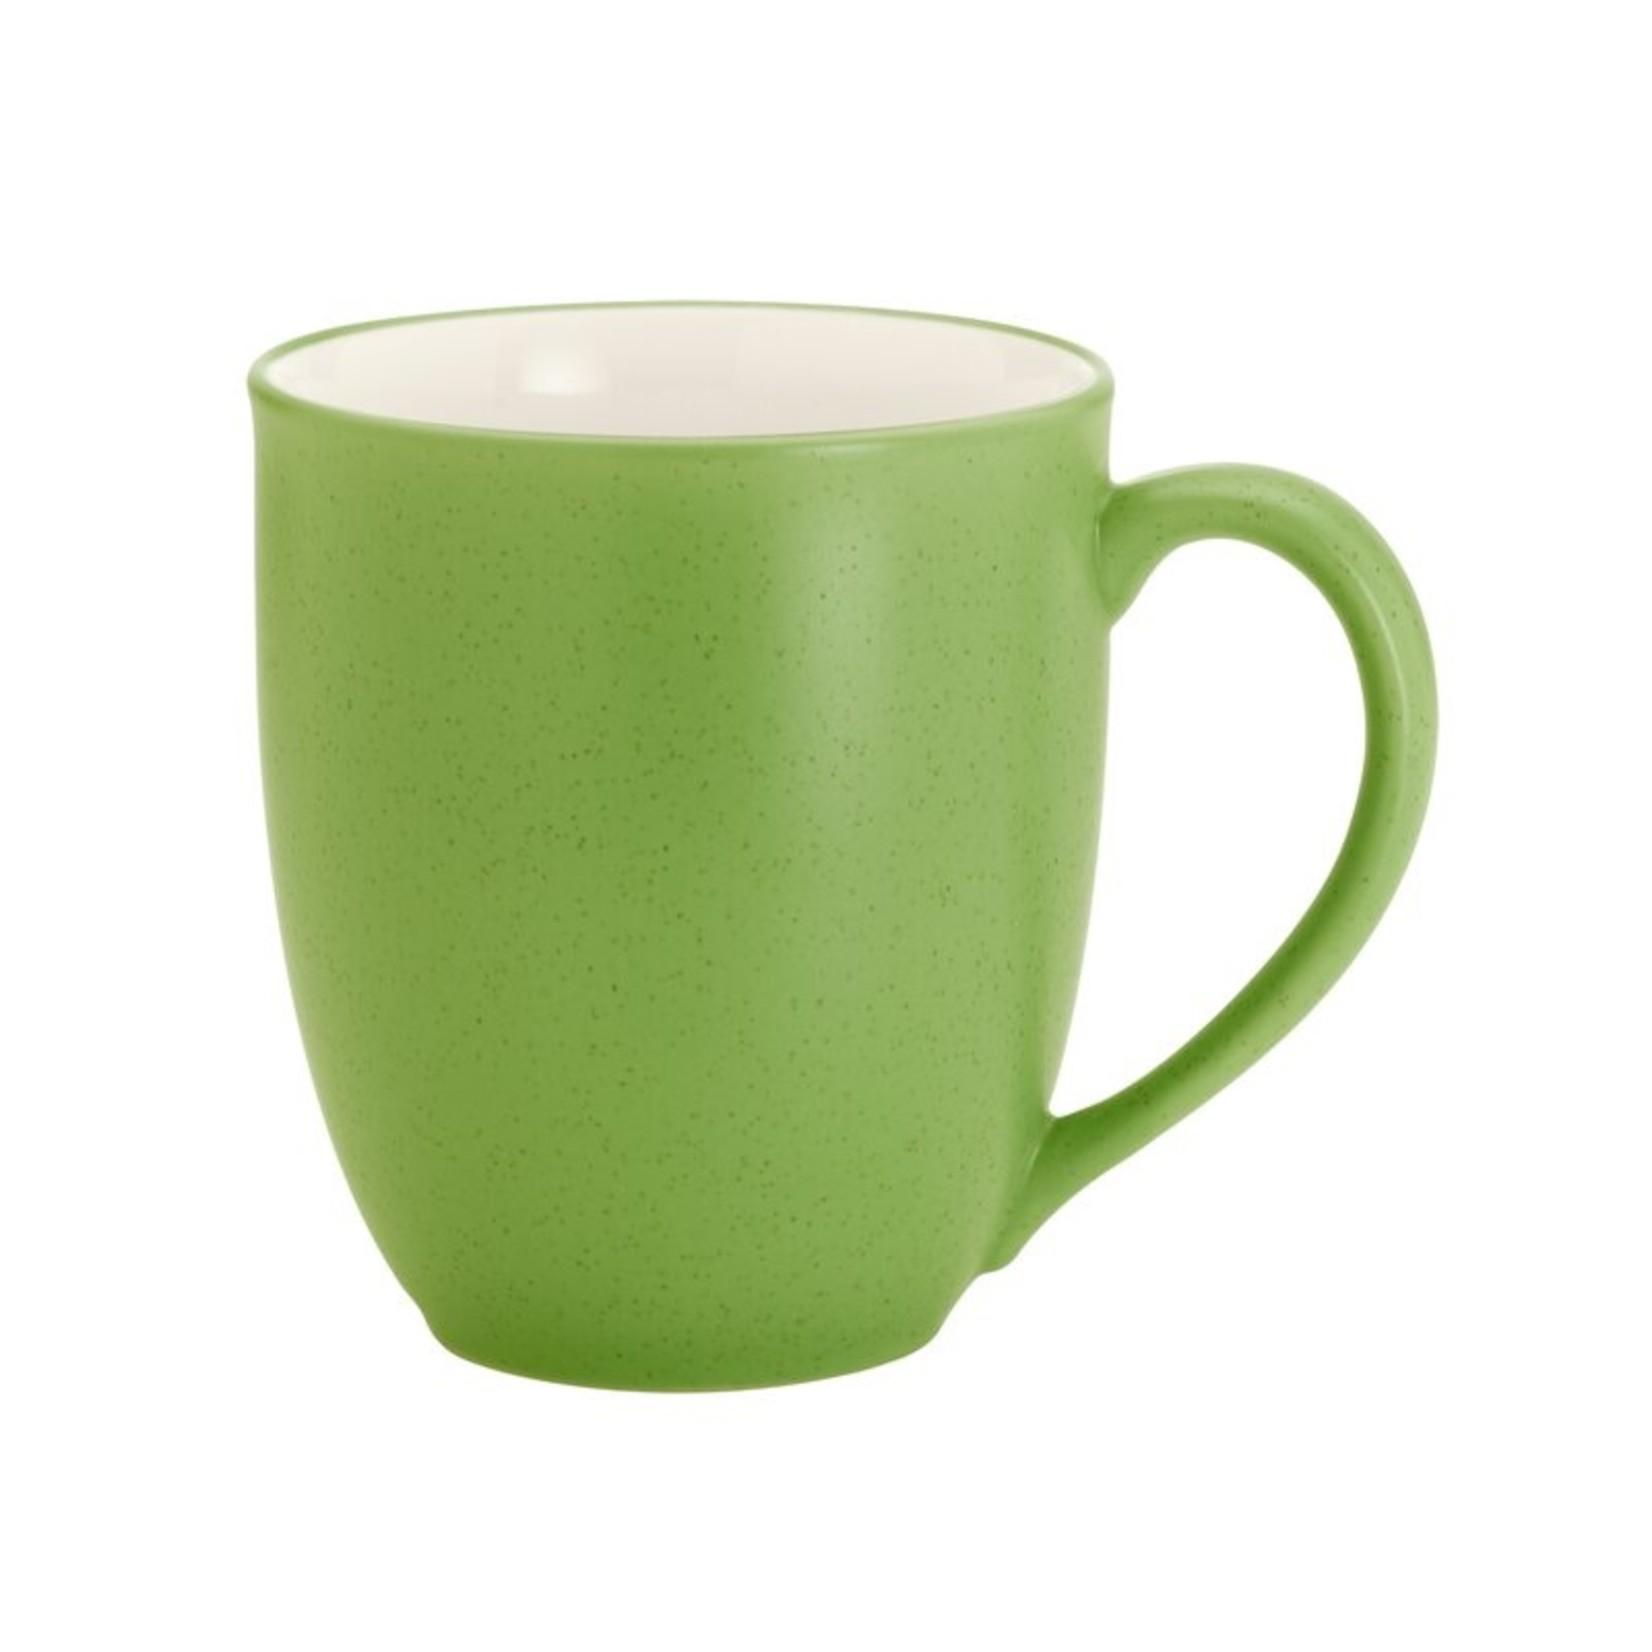 *Colorwave Coffee Mug - Apple Green